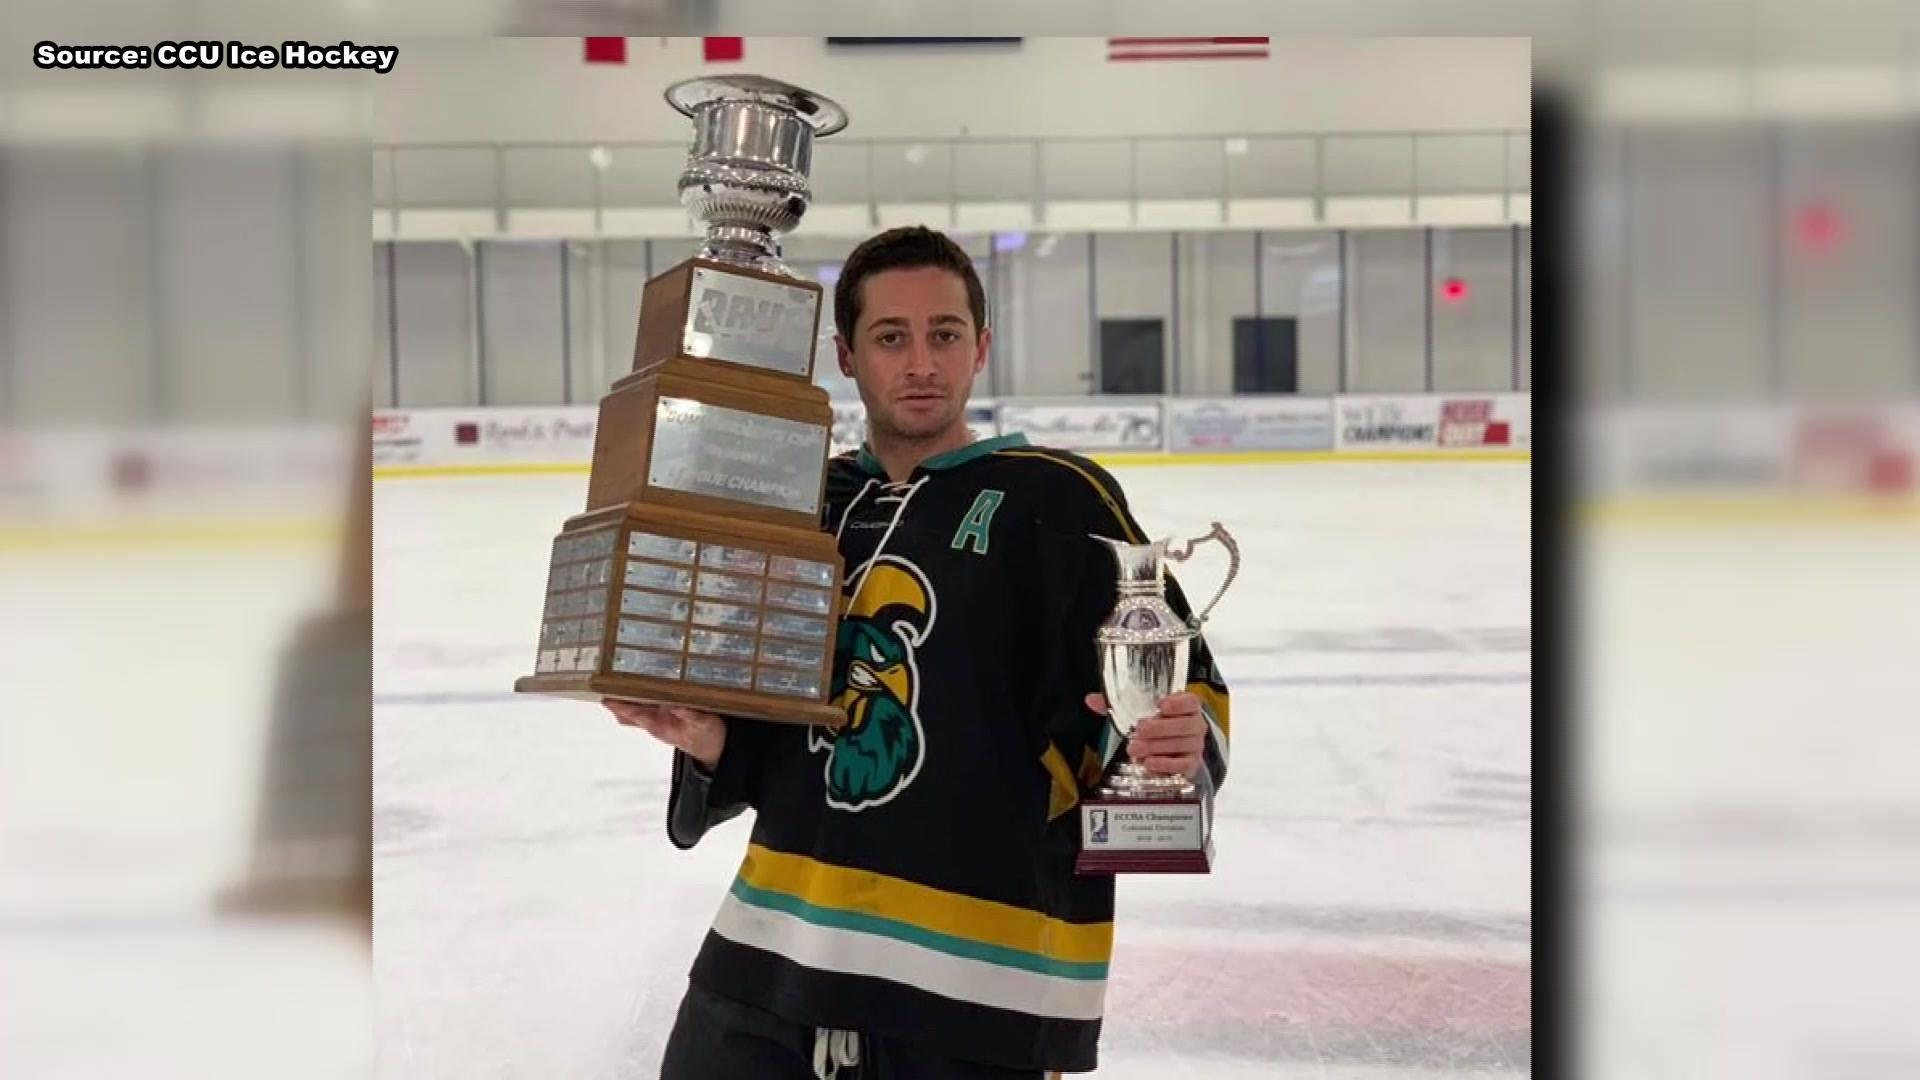 CCU Hockey Champs